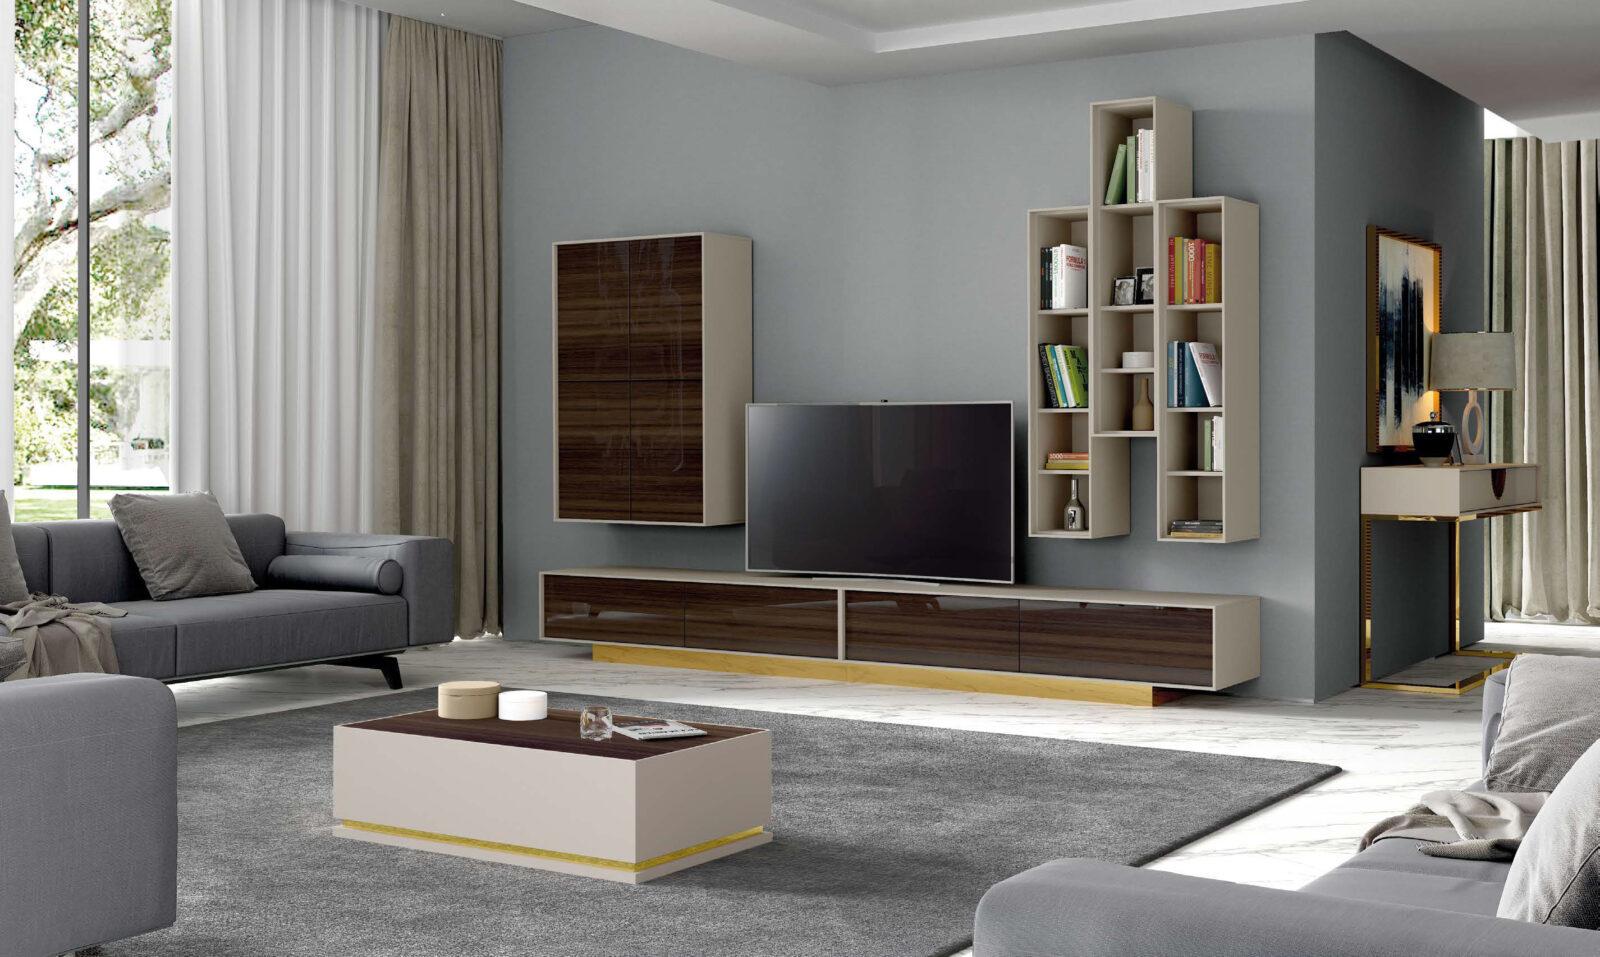 Sala de estar ry 08 escorpi o interiores for Muebles industriales sala de estar